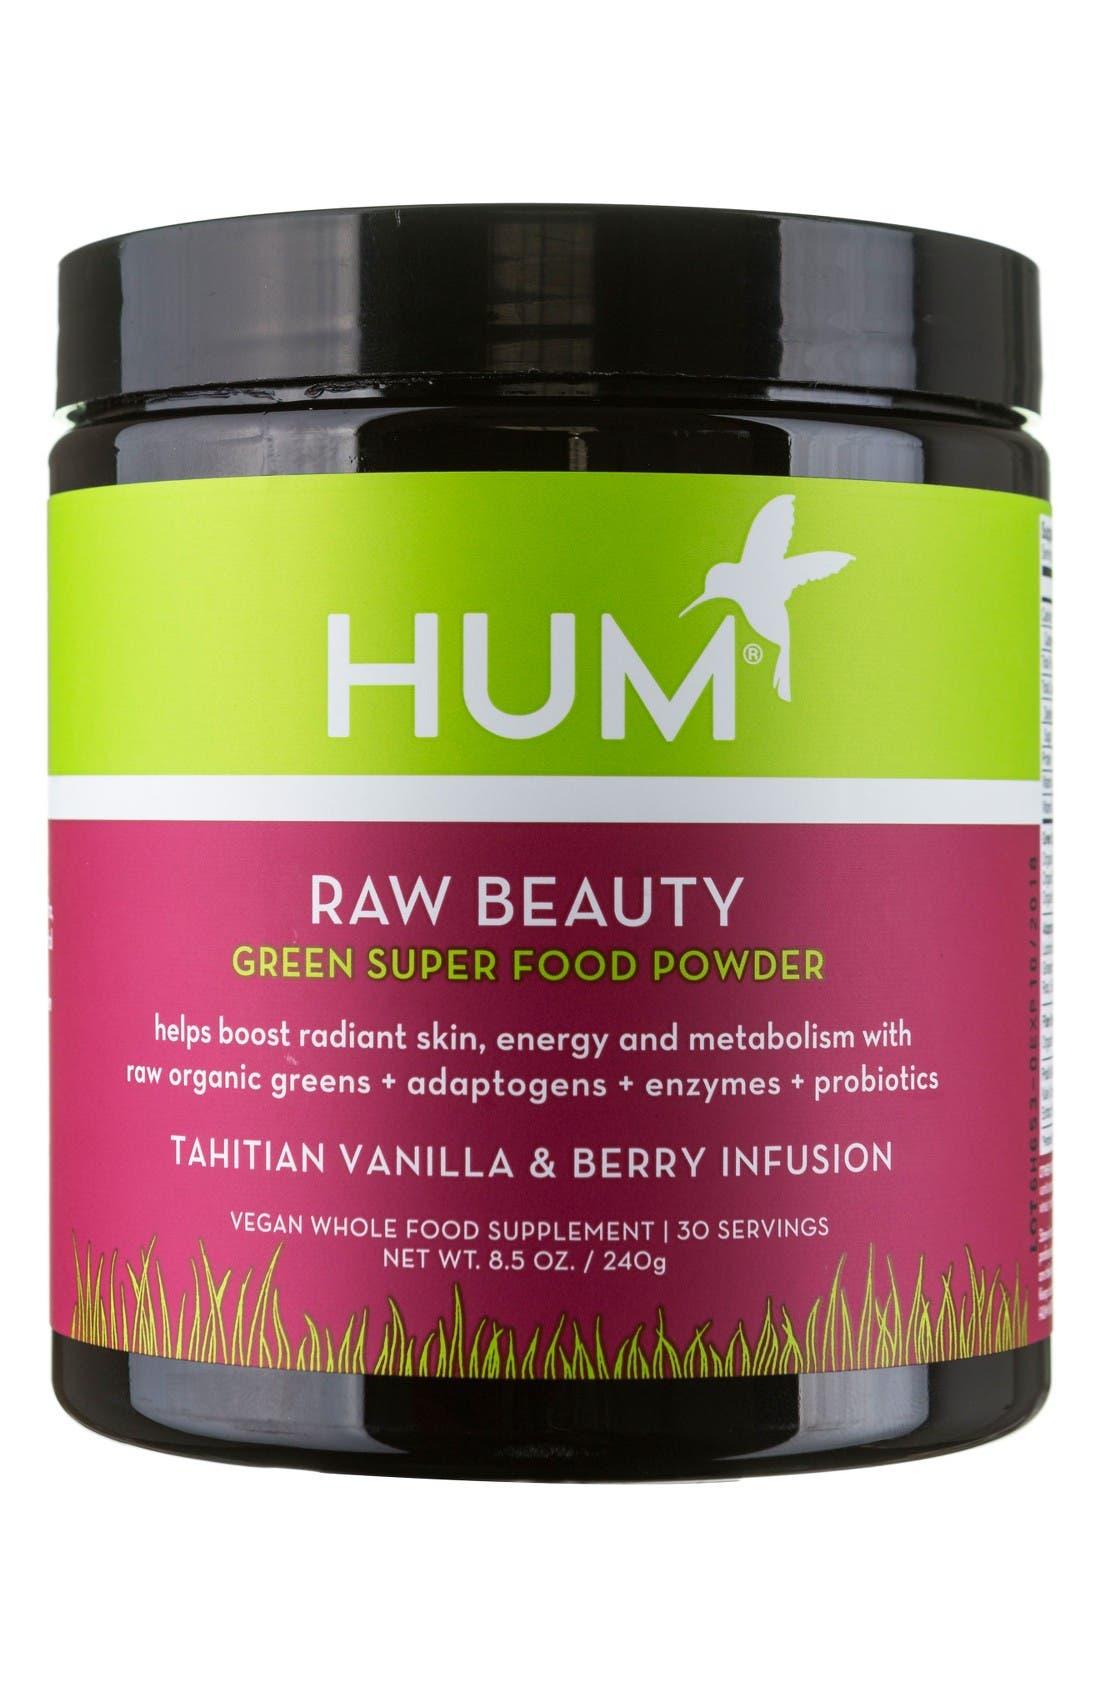 Main Image - Hum Nutrition Raw Beauty Tahitian Vanilla & Berry Infusion Skin & Energy Green Superfood Powder